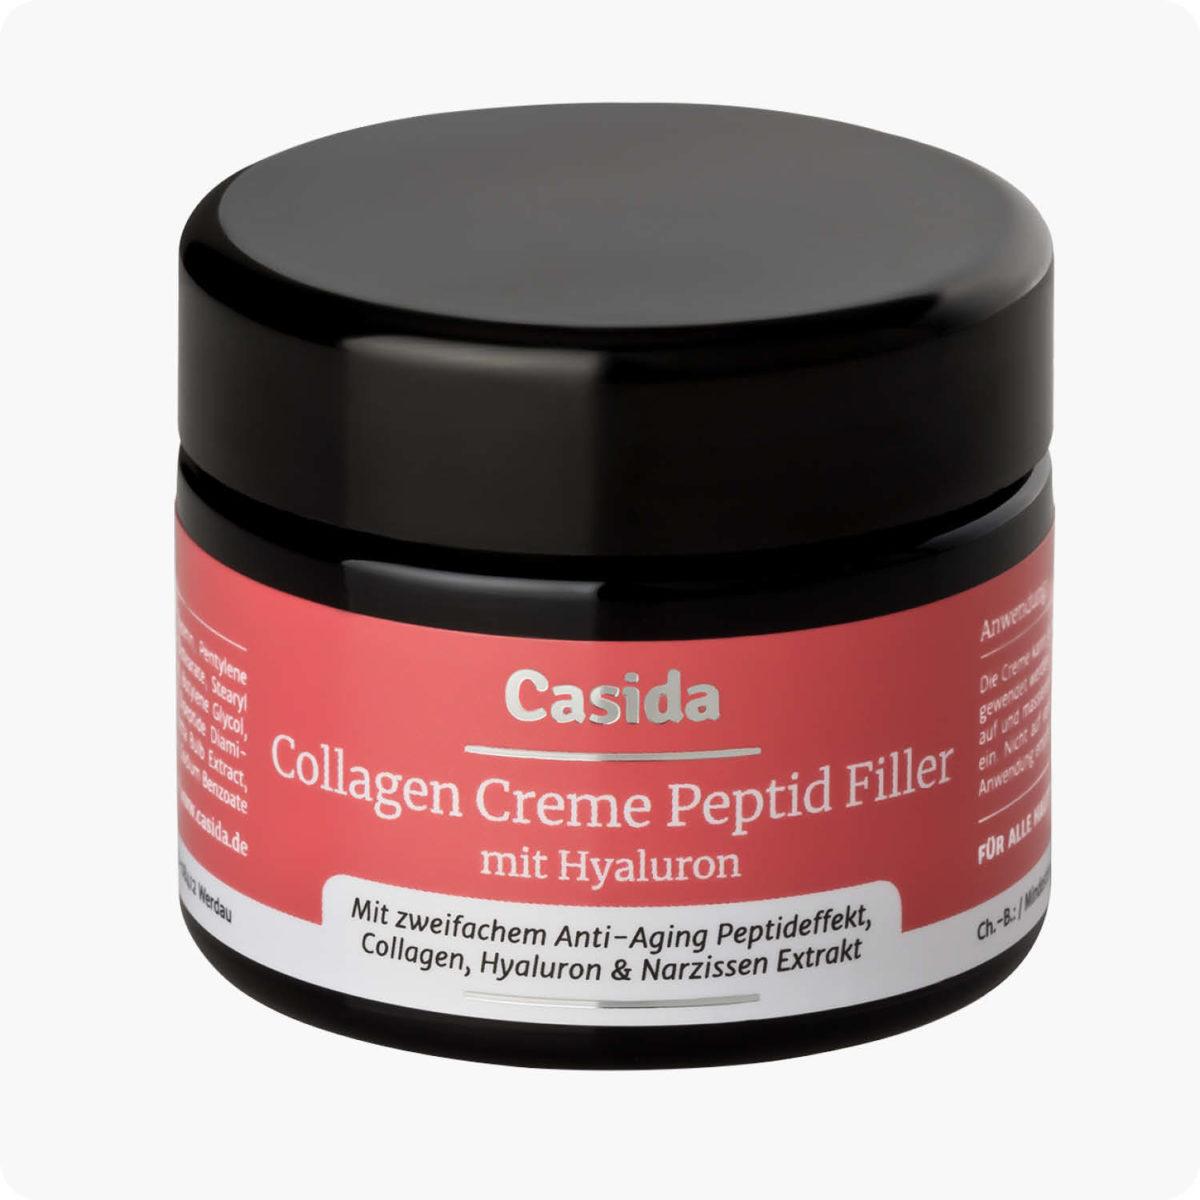 Casida Collagen Cream Peptid Filler + Hyaluron – 50 ml 15408250 PZN Apotheke Anti-Aging Gesichtspflege